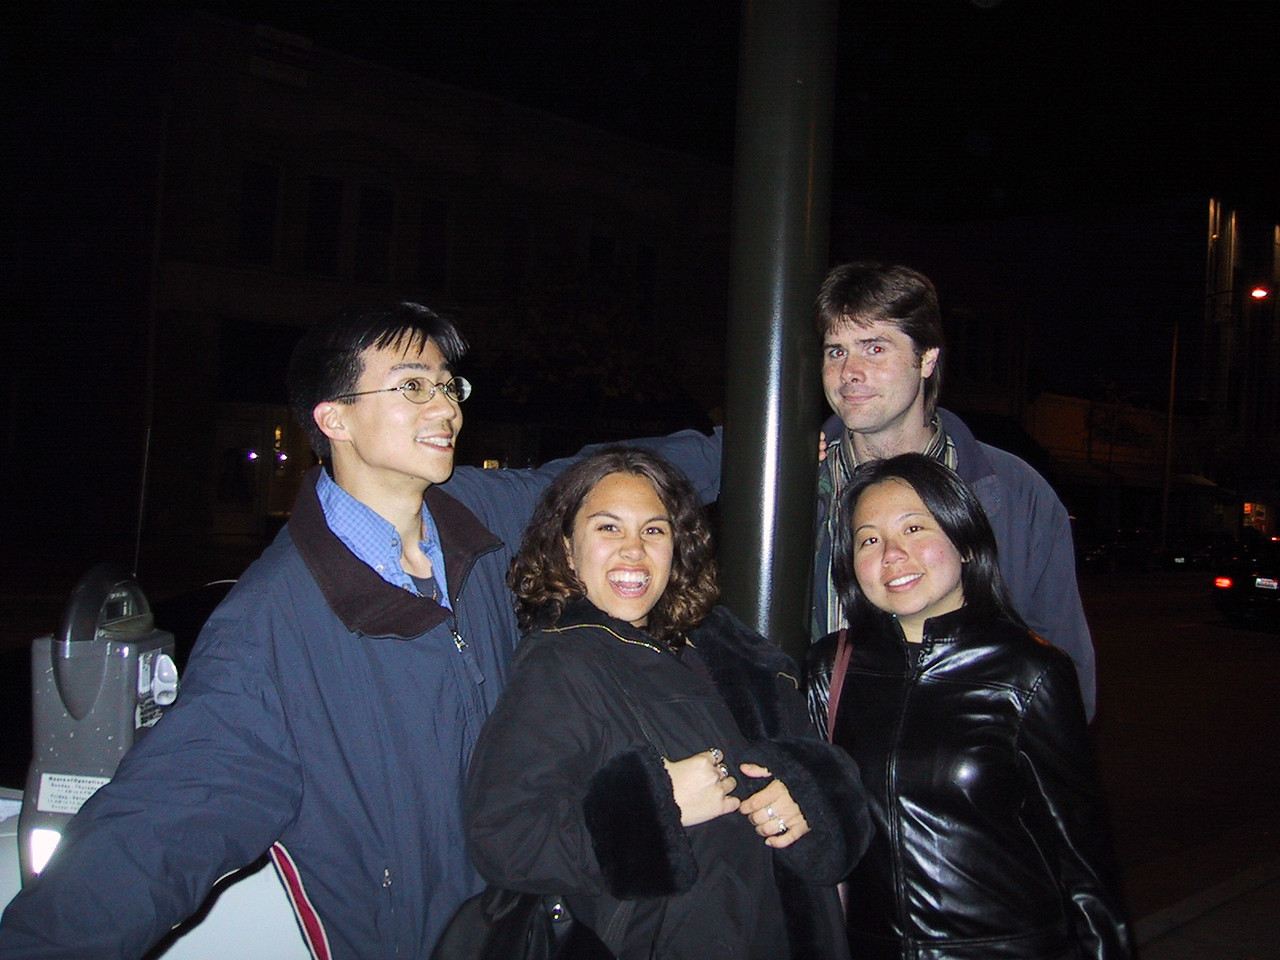 Ben, Jackie, Rhett, & Xiao-Wei in Old Town